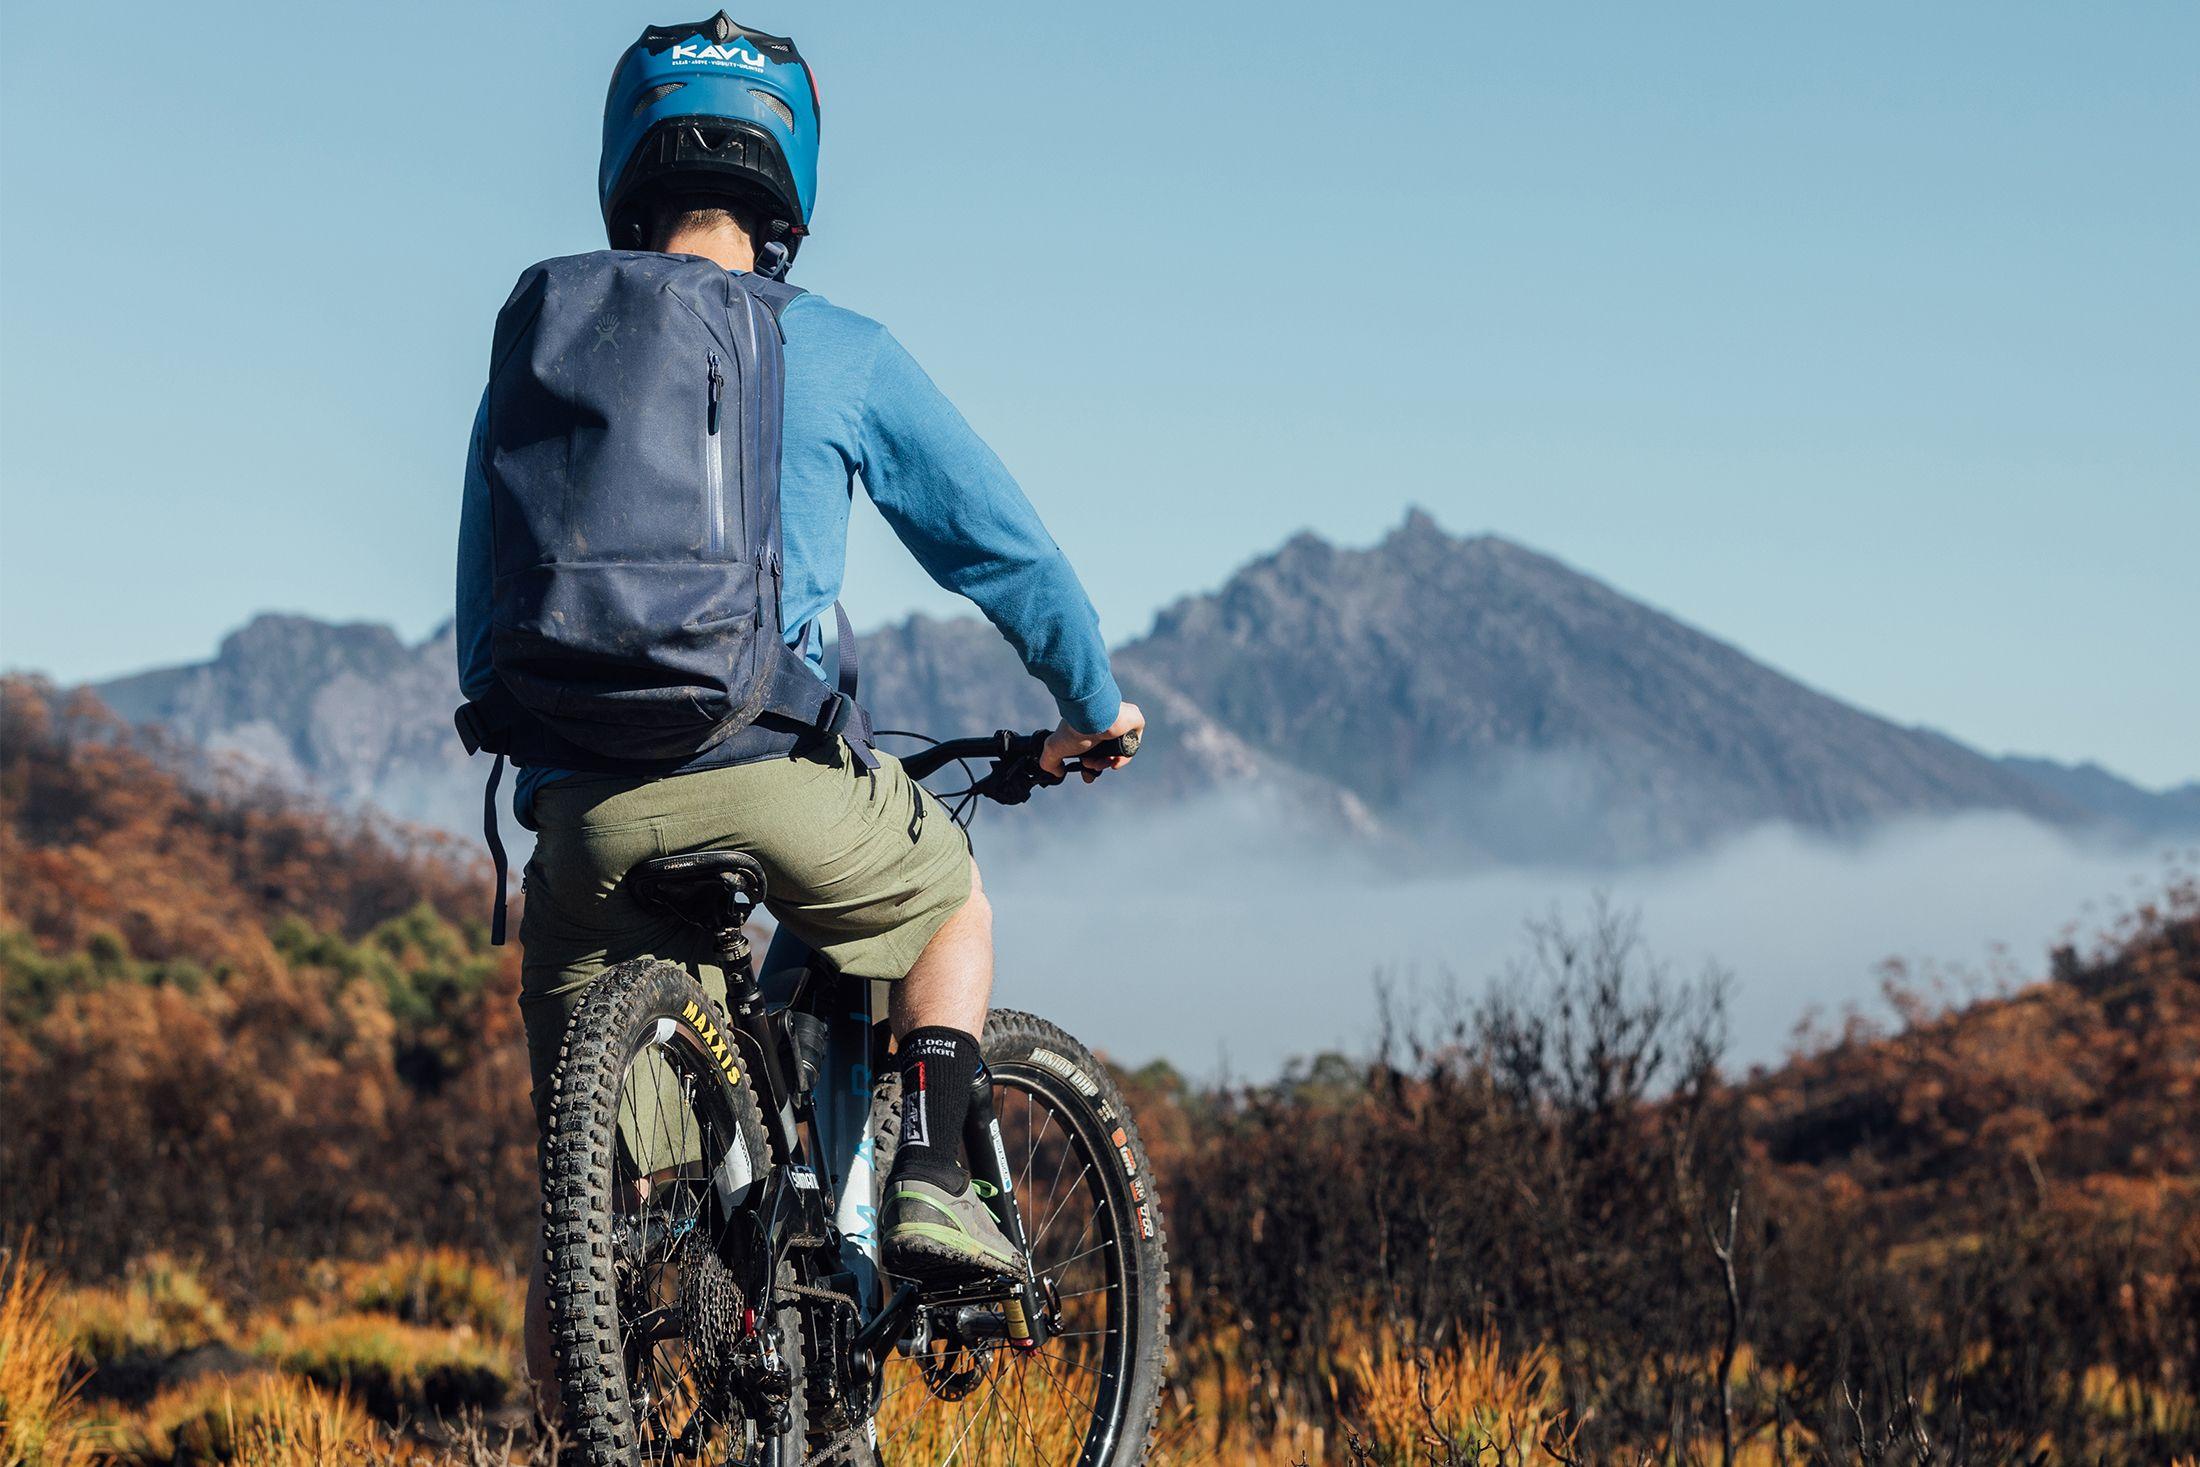 Mtb Pro Picks Best Mountain Bike Accessories For 2019 Best